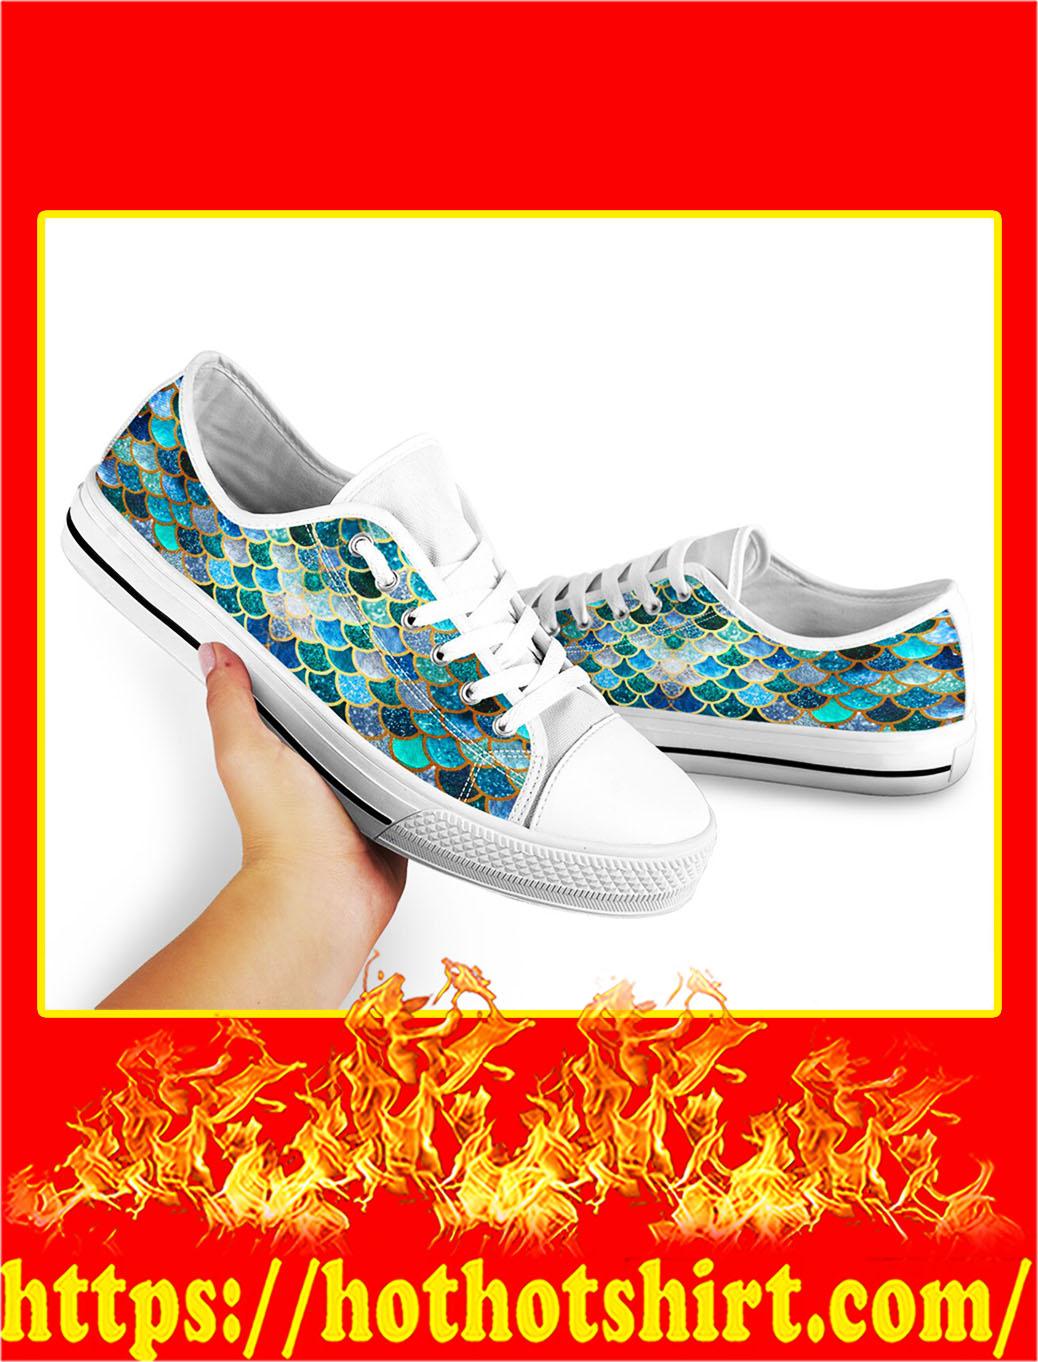 Mermaid low top shoes- pic 2